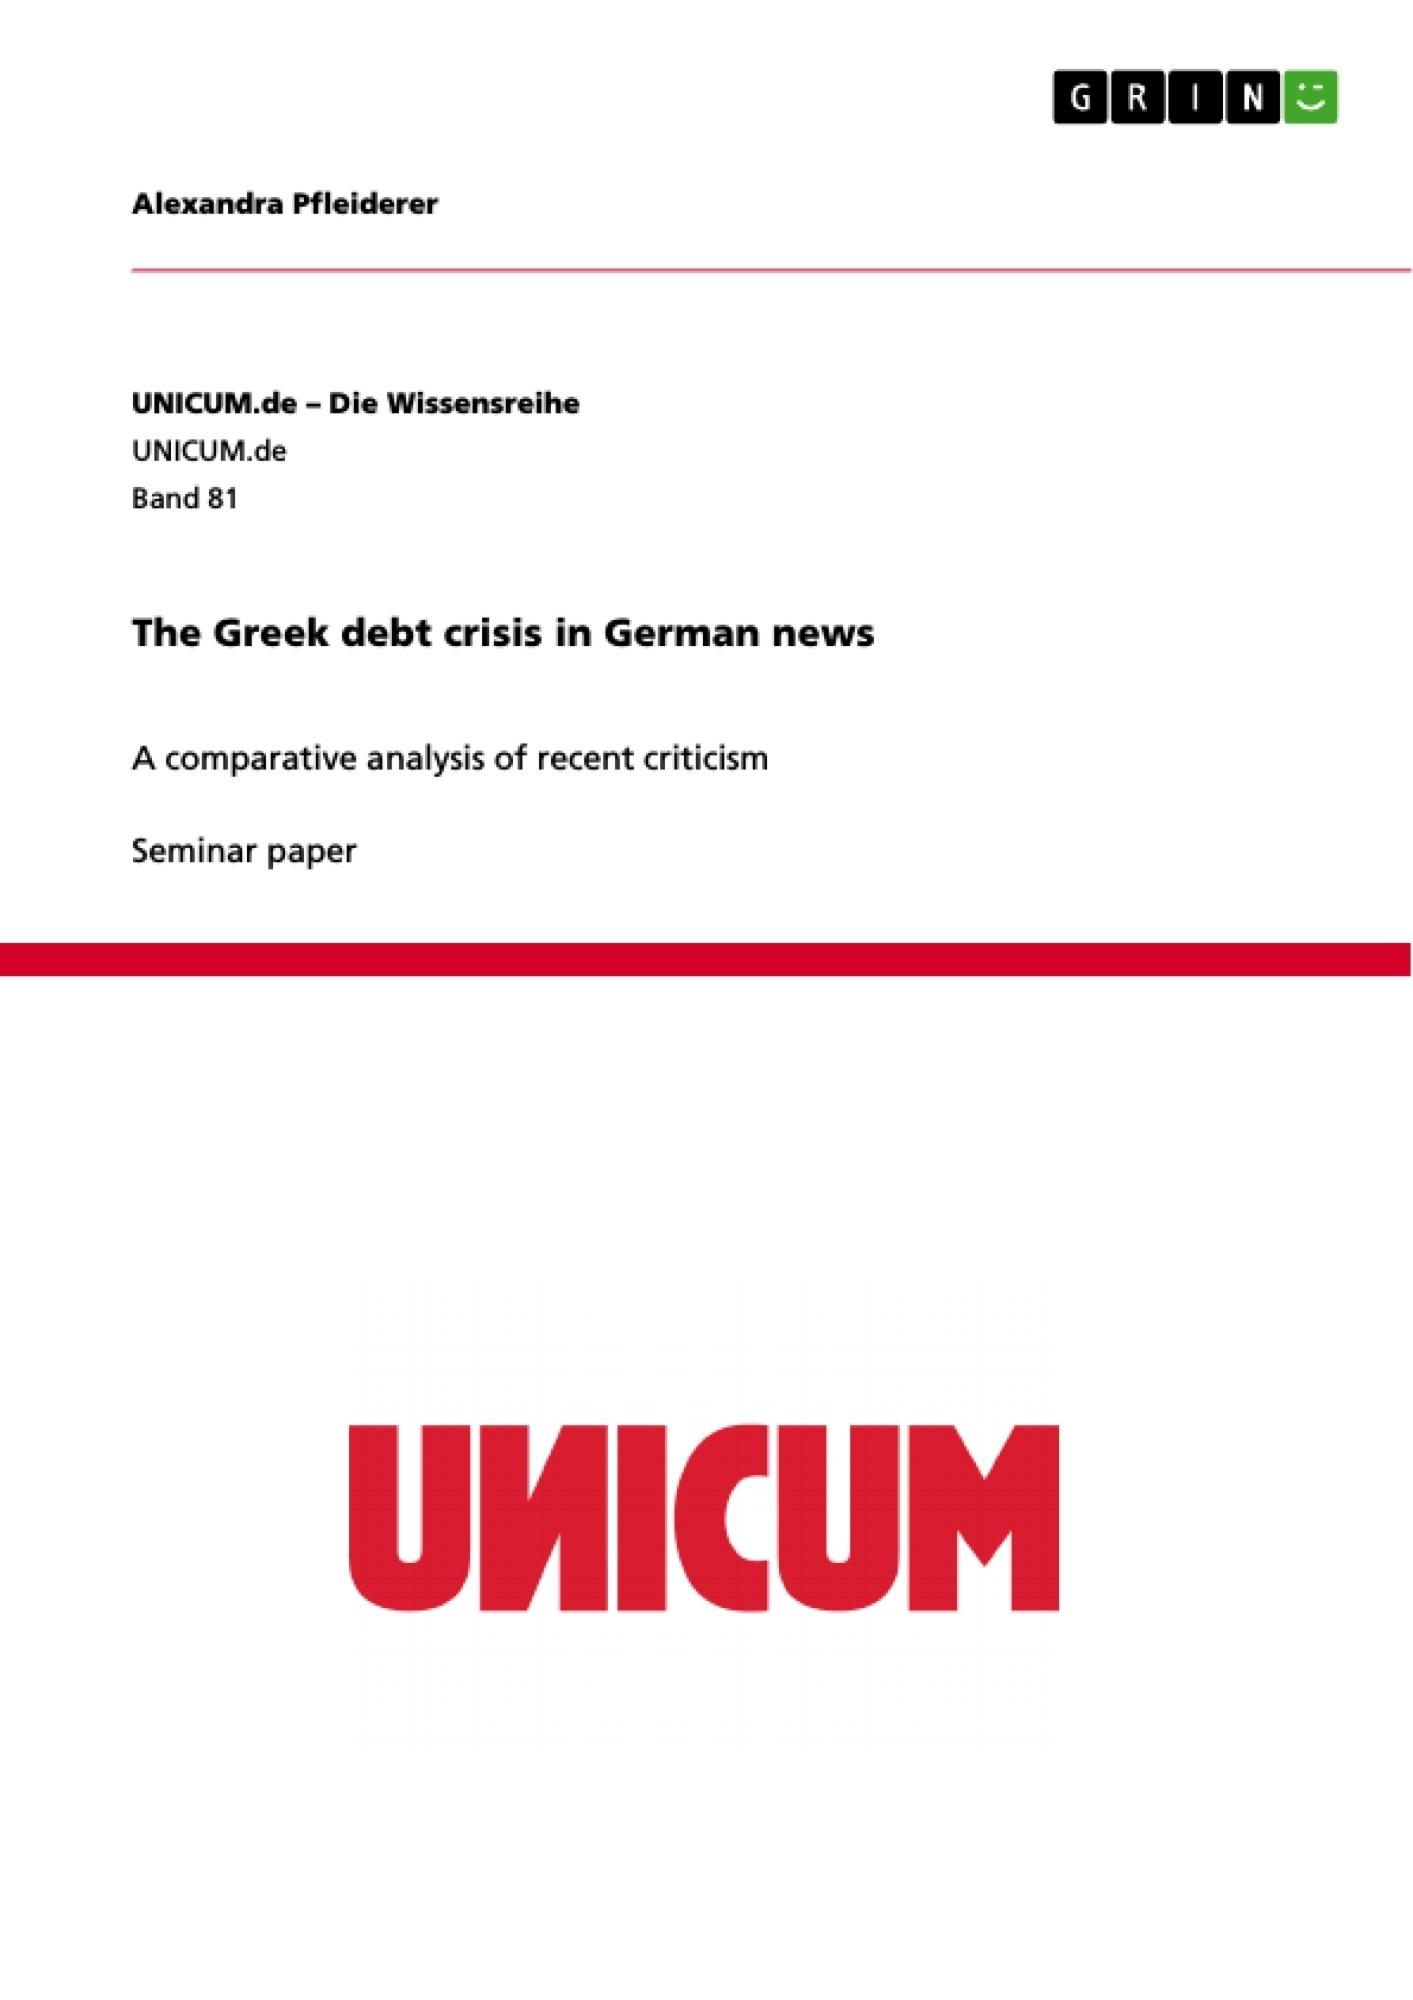 Title: The Greek debt crisis in German news